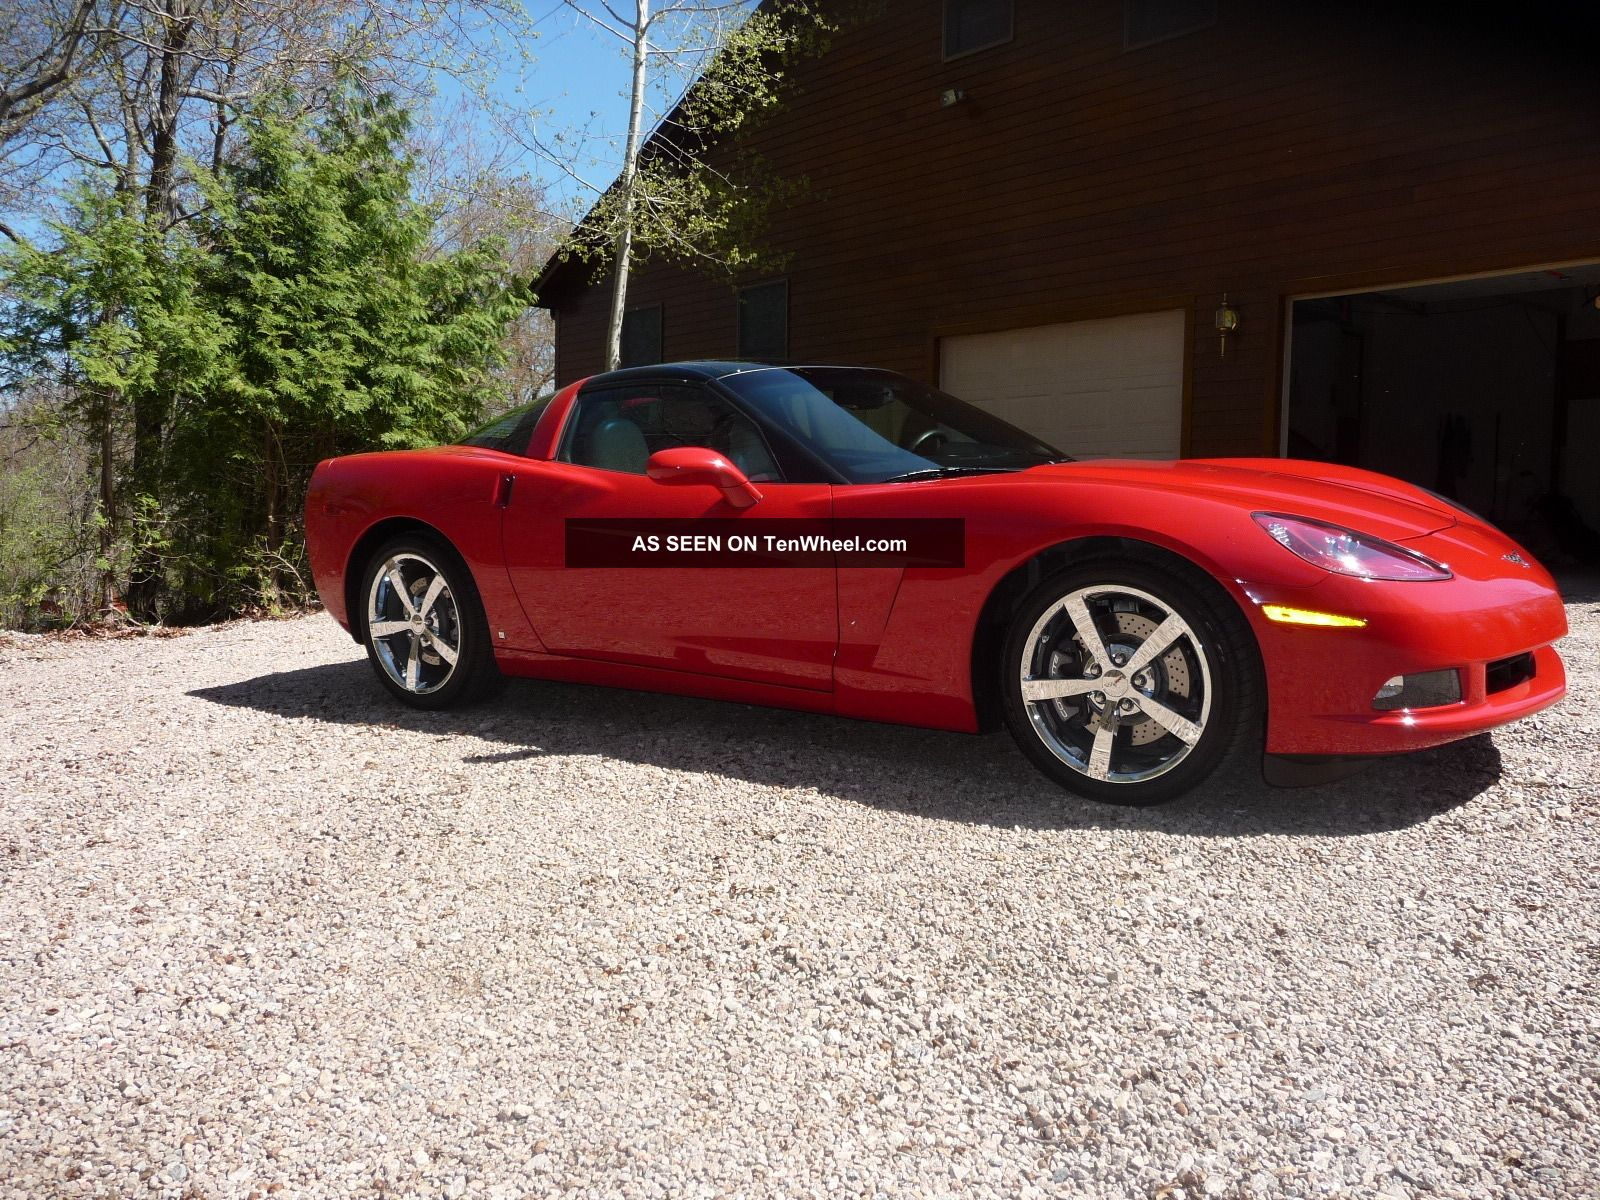 2009 Chevrolet Corvette 3lt Package And Z51 Under 2+ Yr Ext. Corvette photo